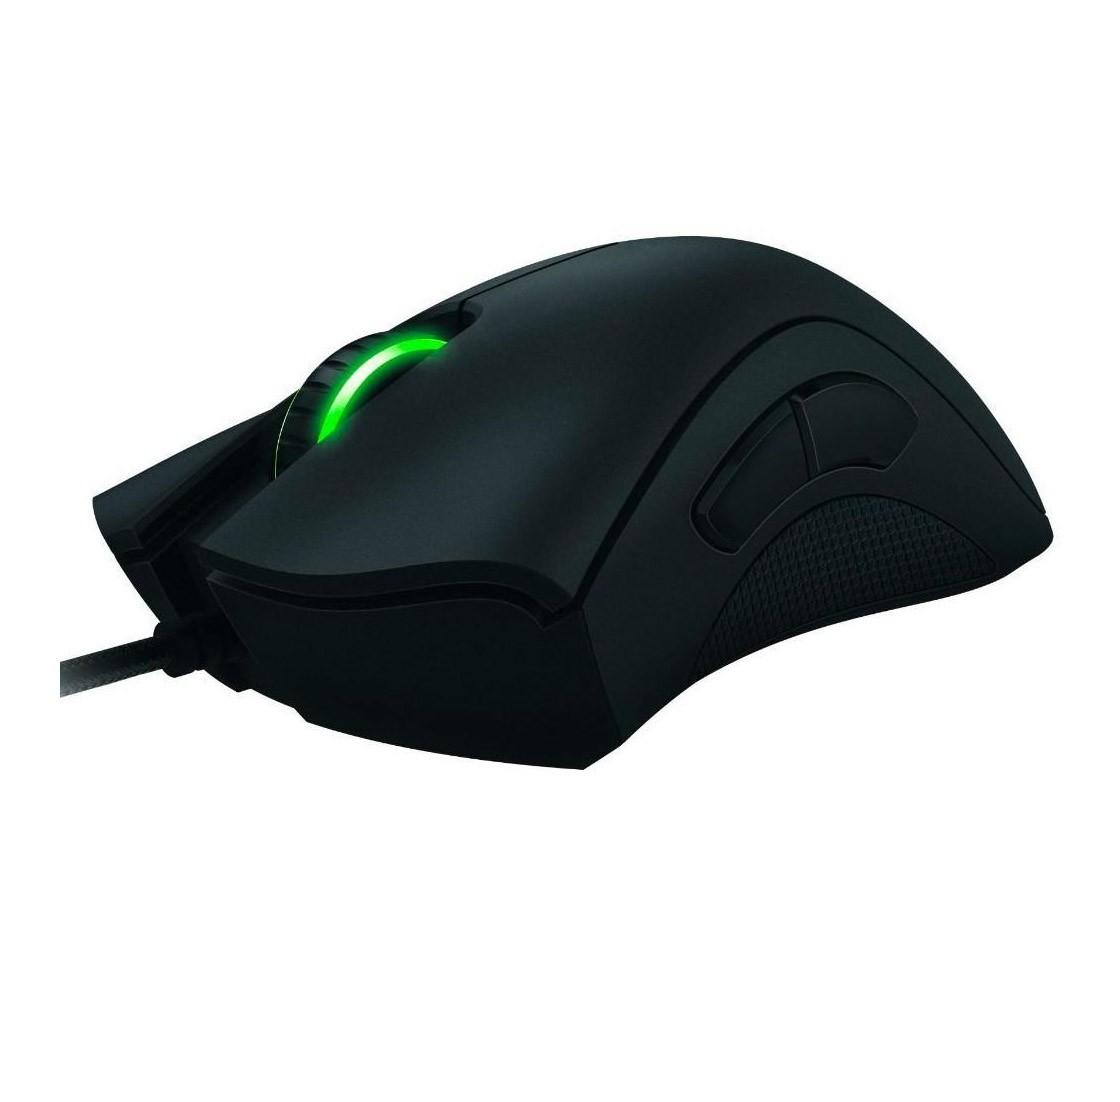 Mouse Gamer Razer Deathadder Essential, Mechanical Switch, 5 Botões 4G, 6400DPI - RZ01-02540100-R3U1